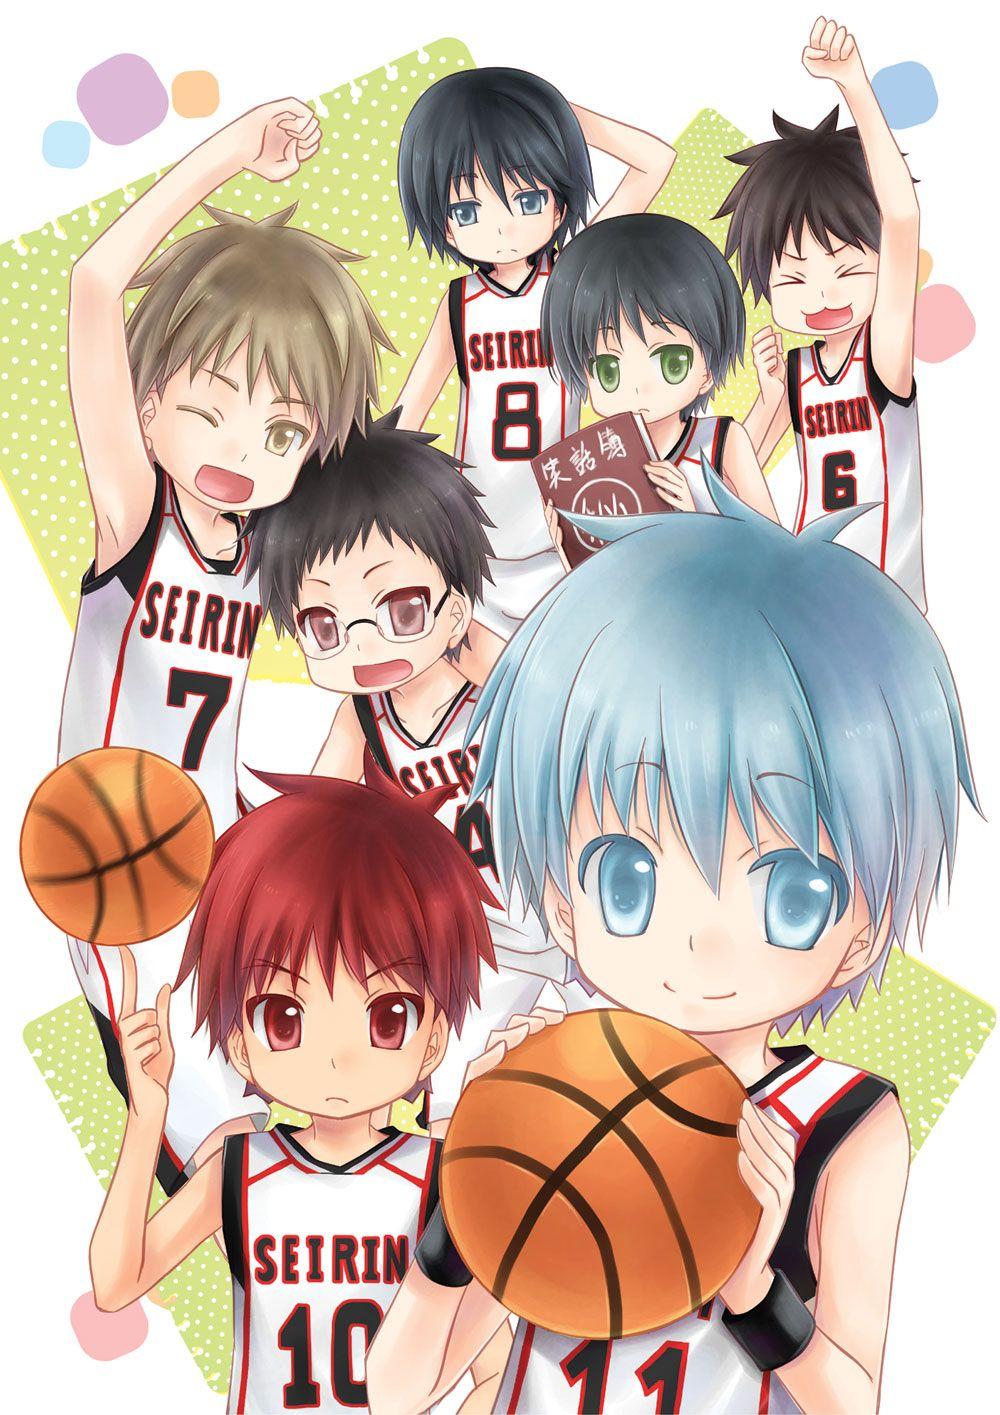 kuroko no basket seirin Recherche Google Anime, Đang yêu